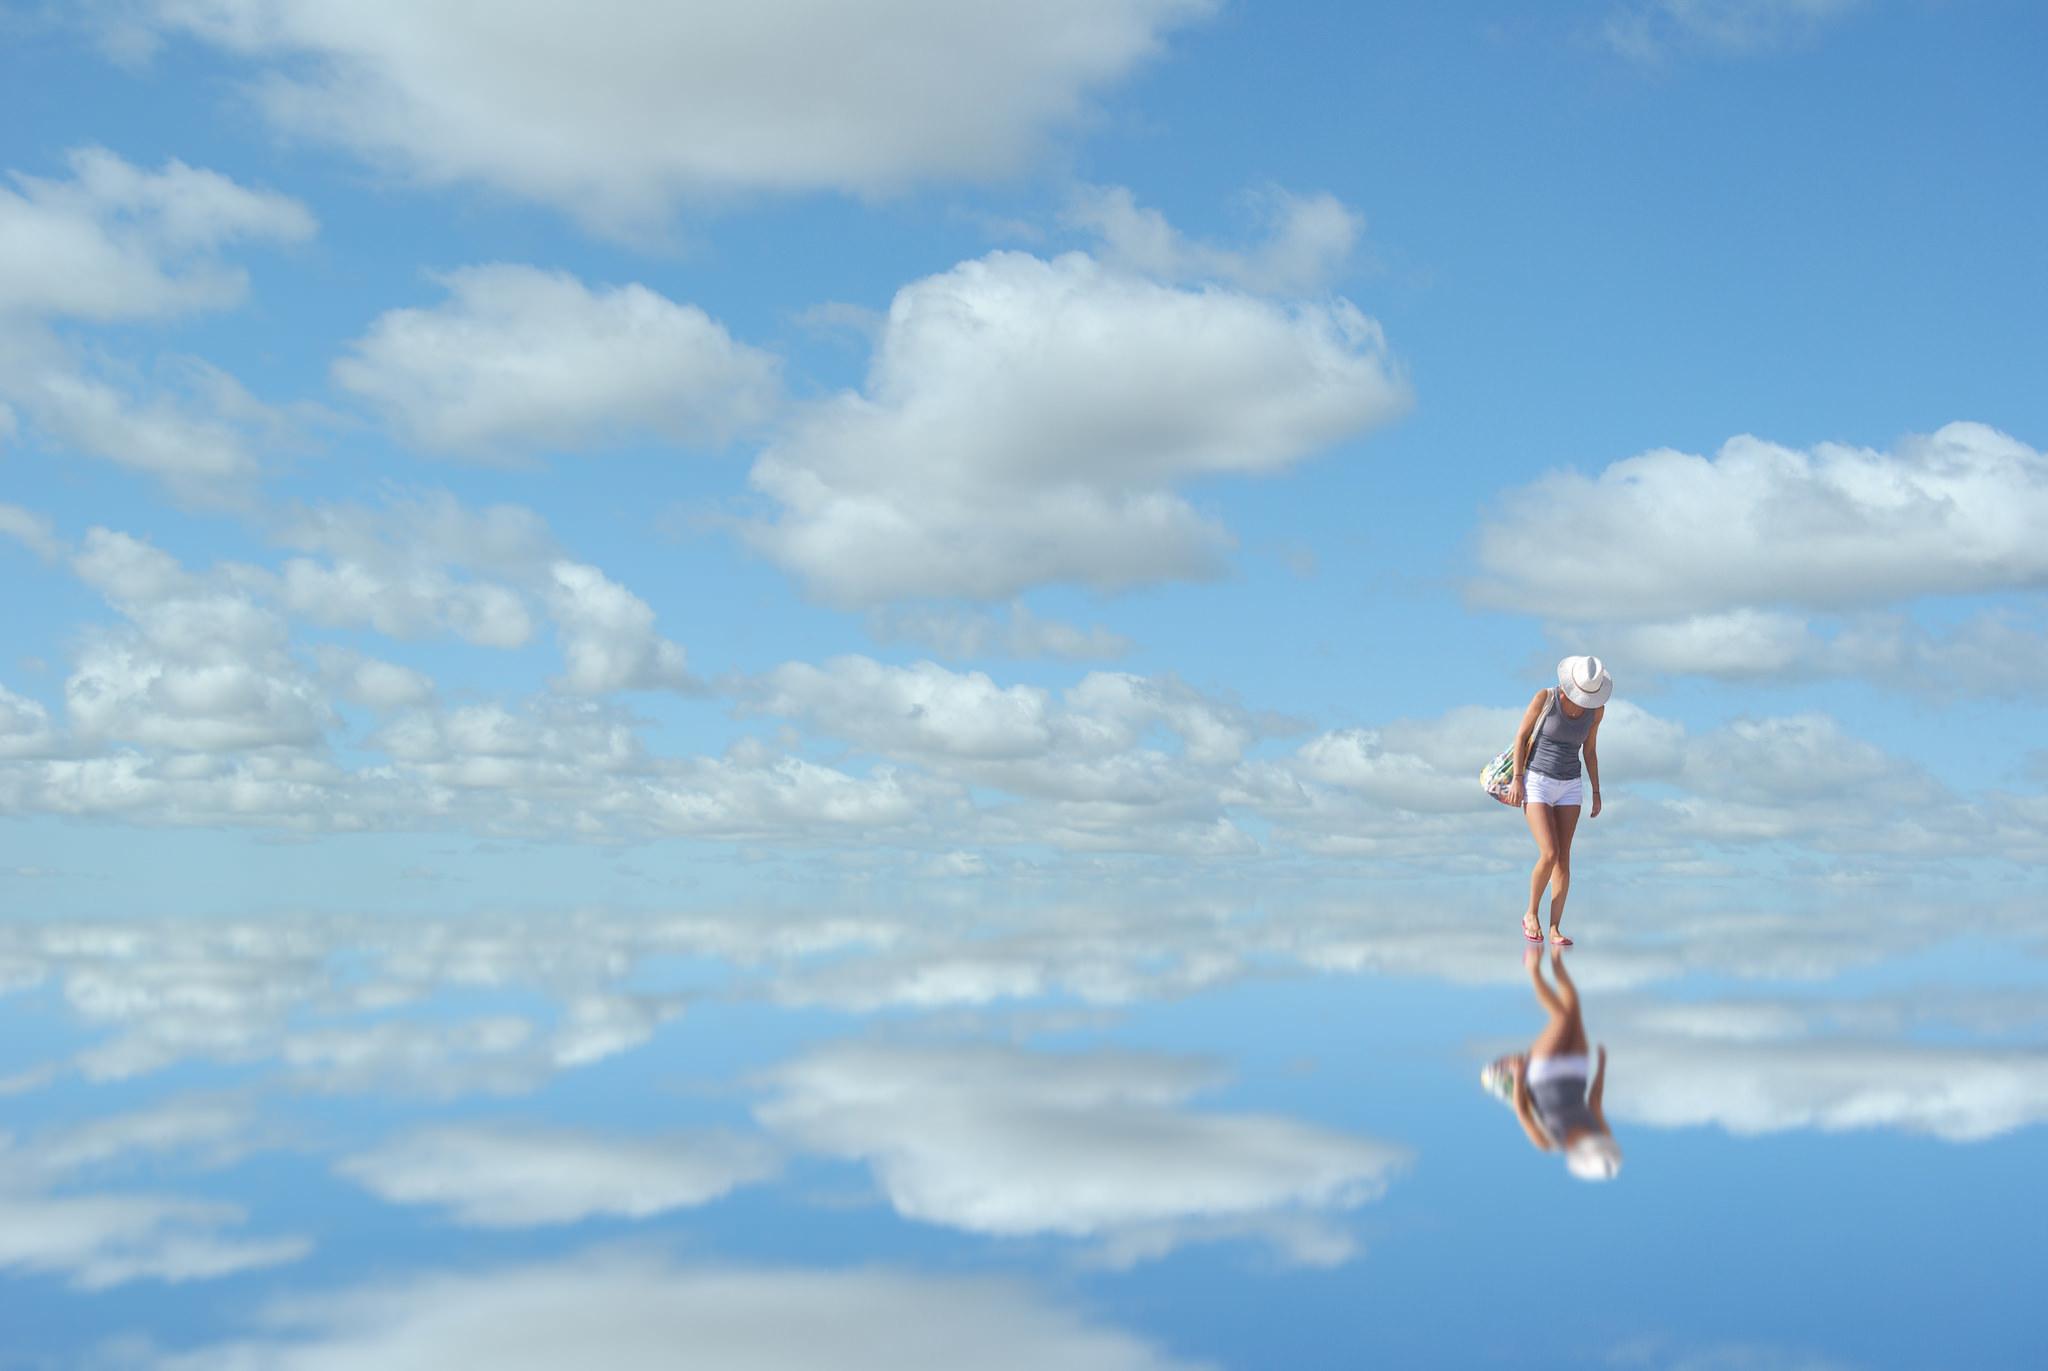 sky-mirror-reflection-woman